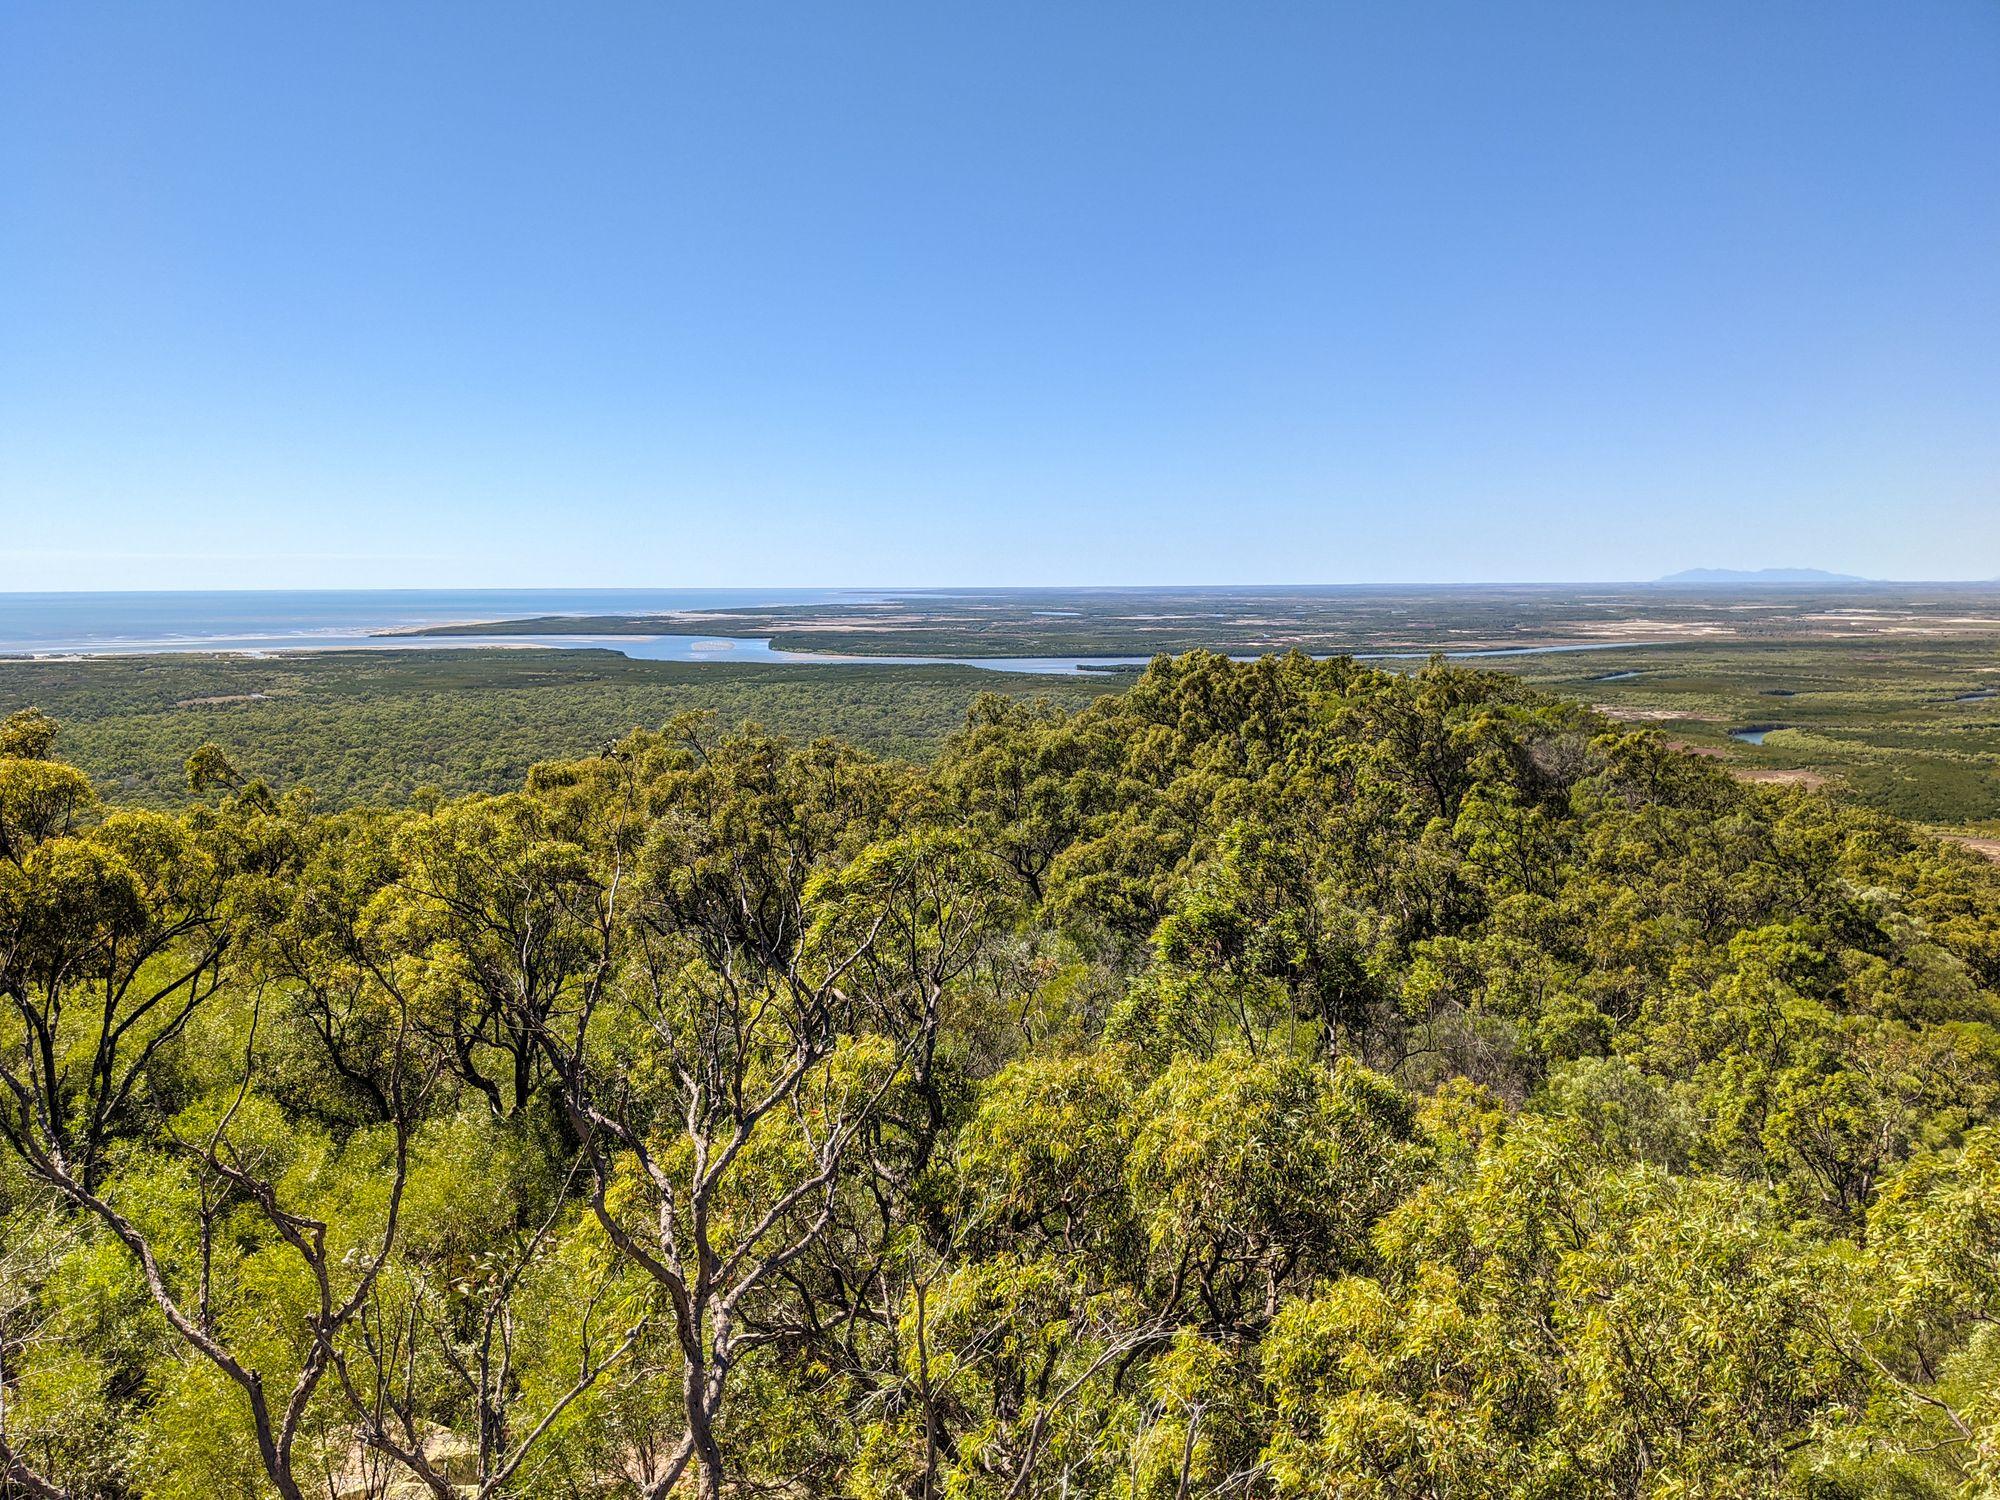 Mt Burrumbush Feltham Cone views